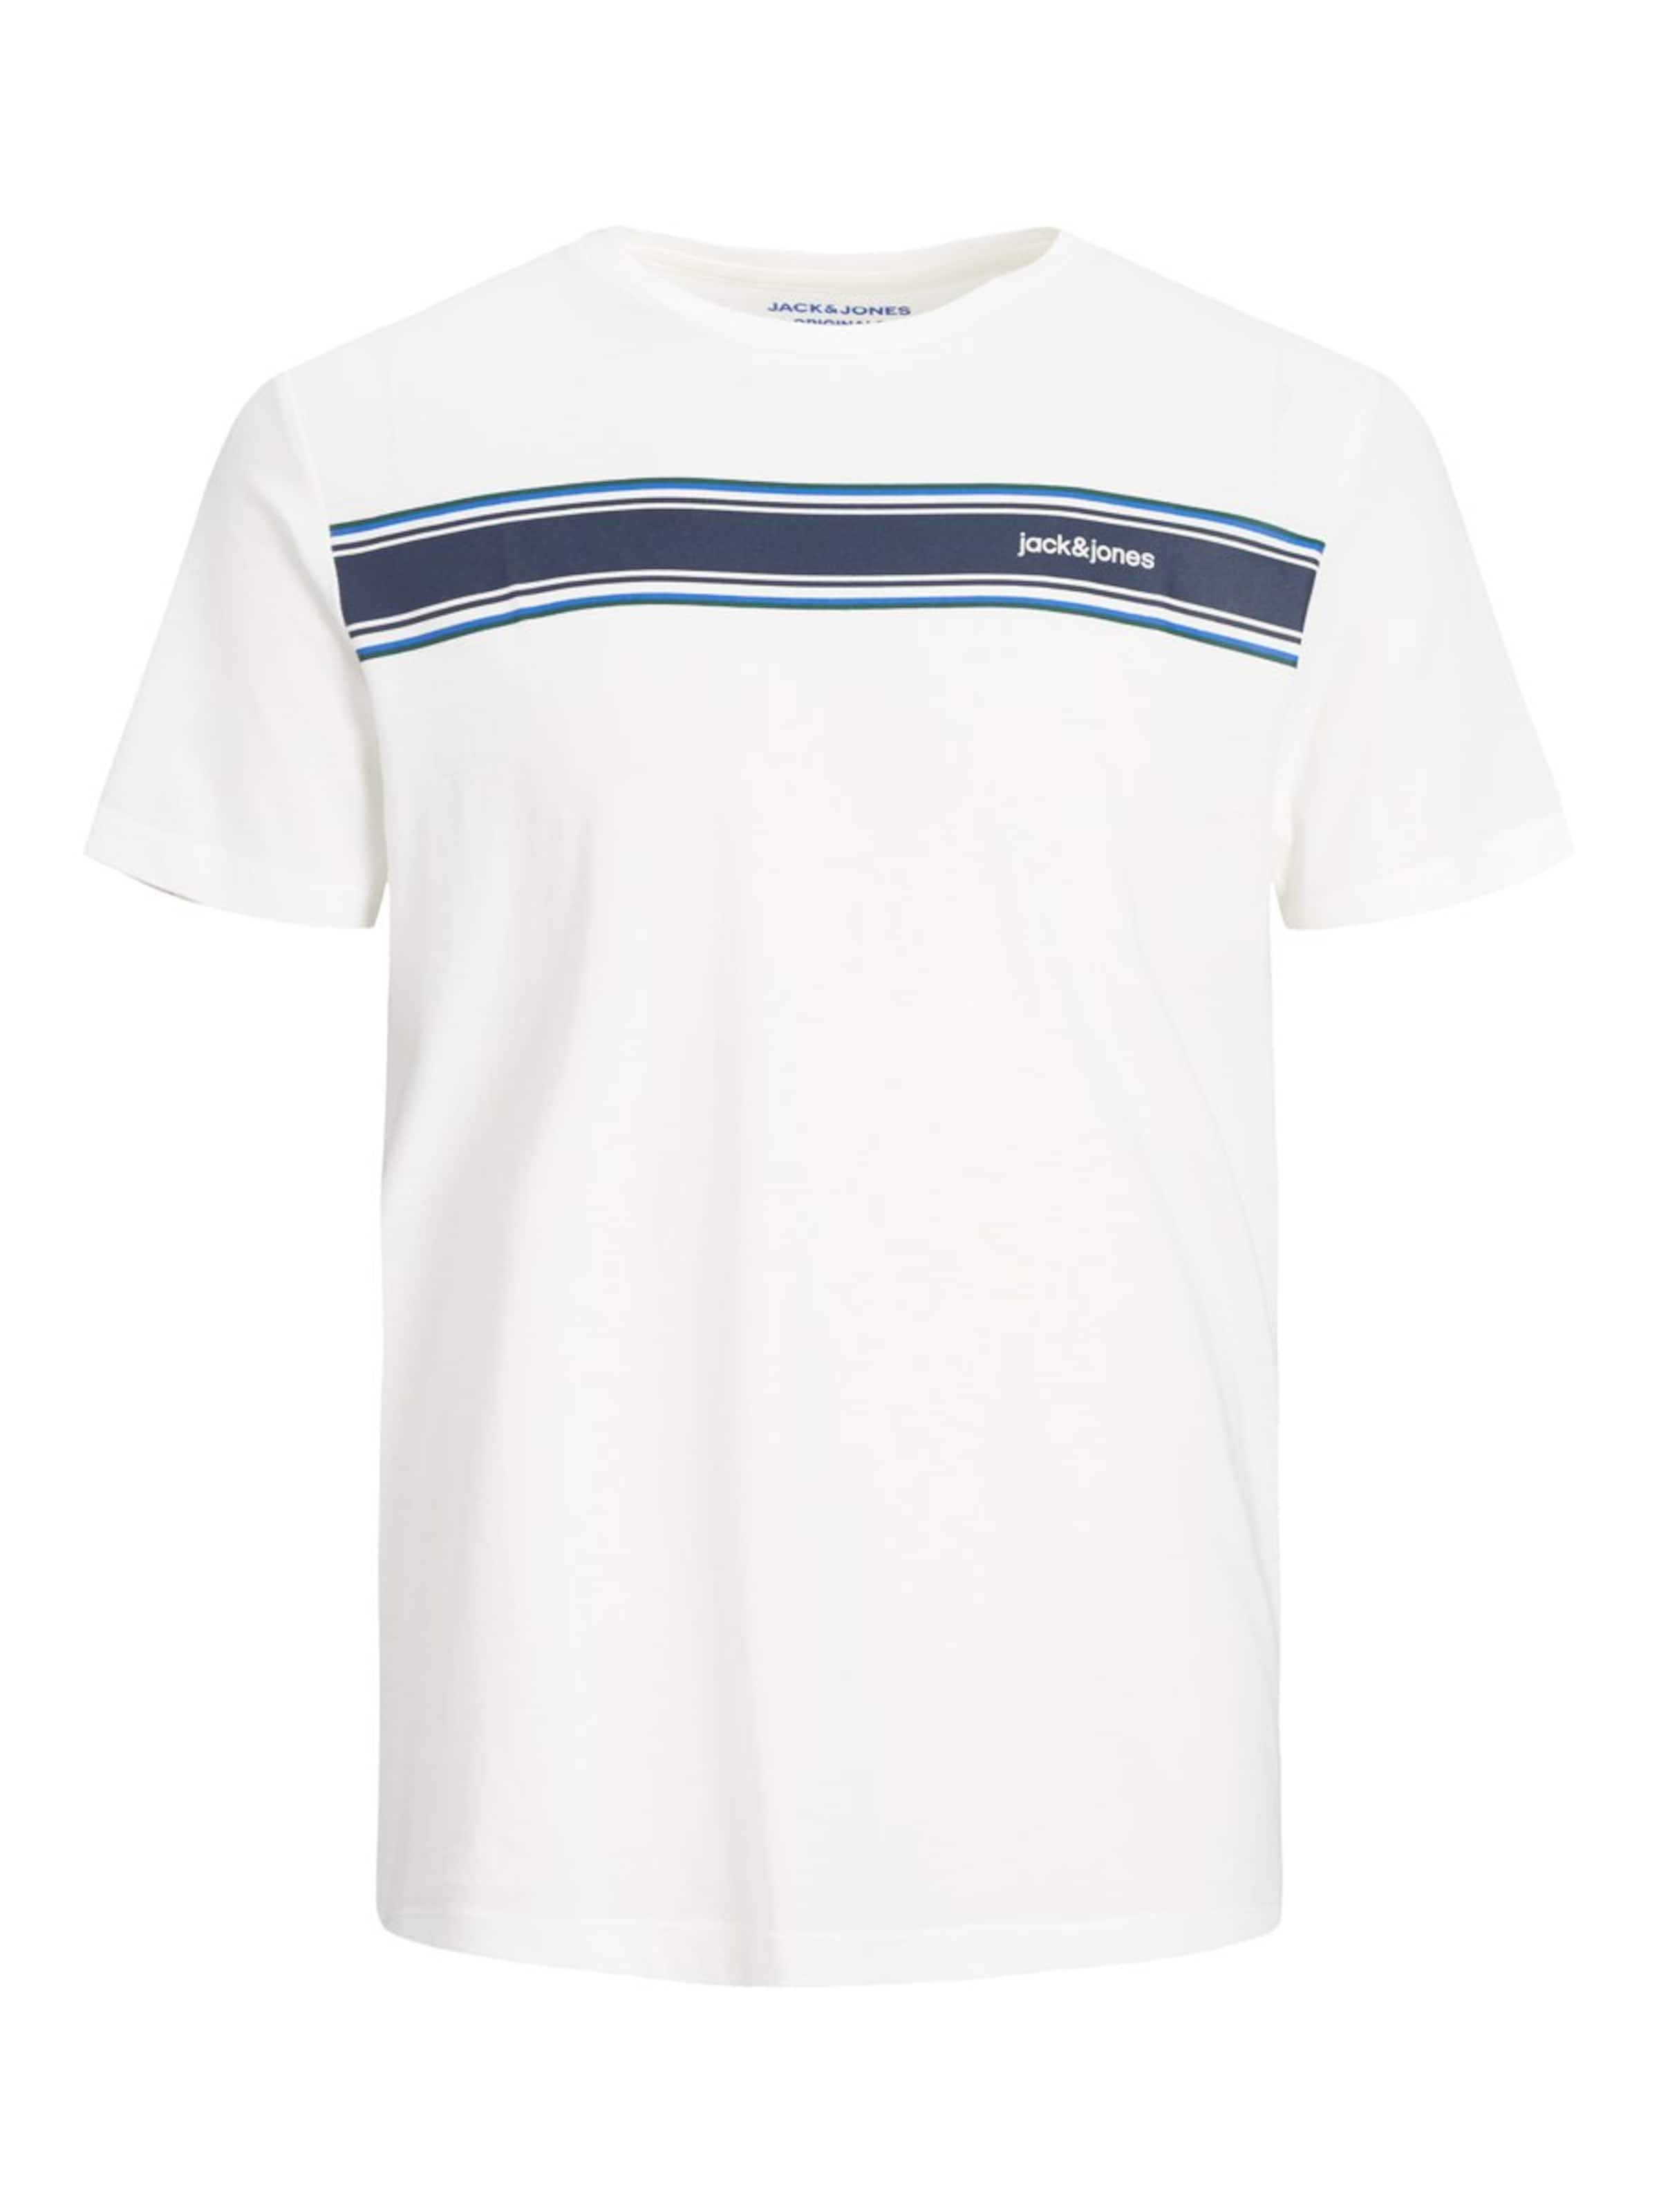 Weiß shirt In Jones T Jackamp; n8wXO0Pk